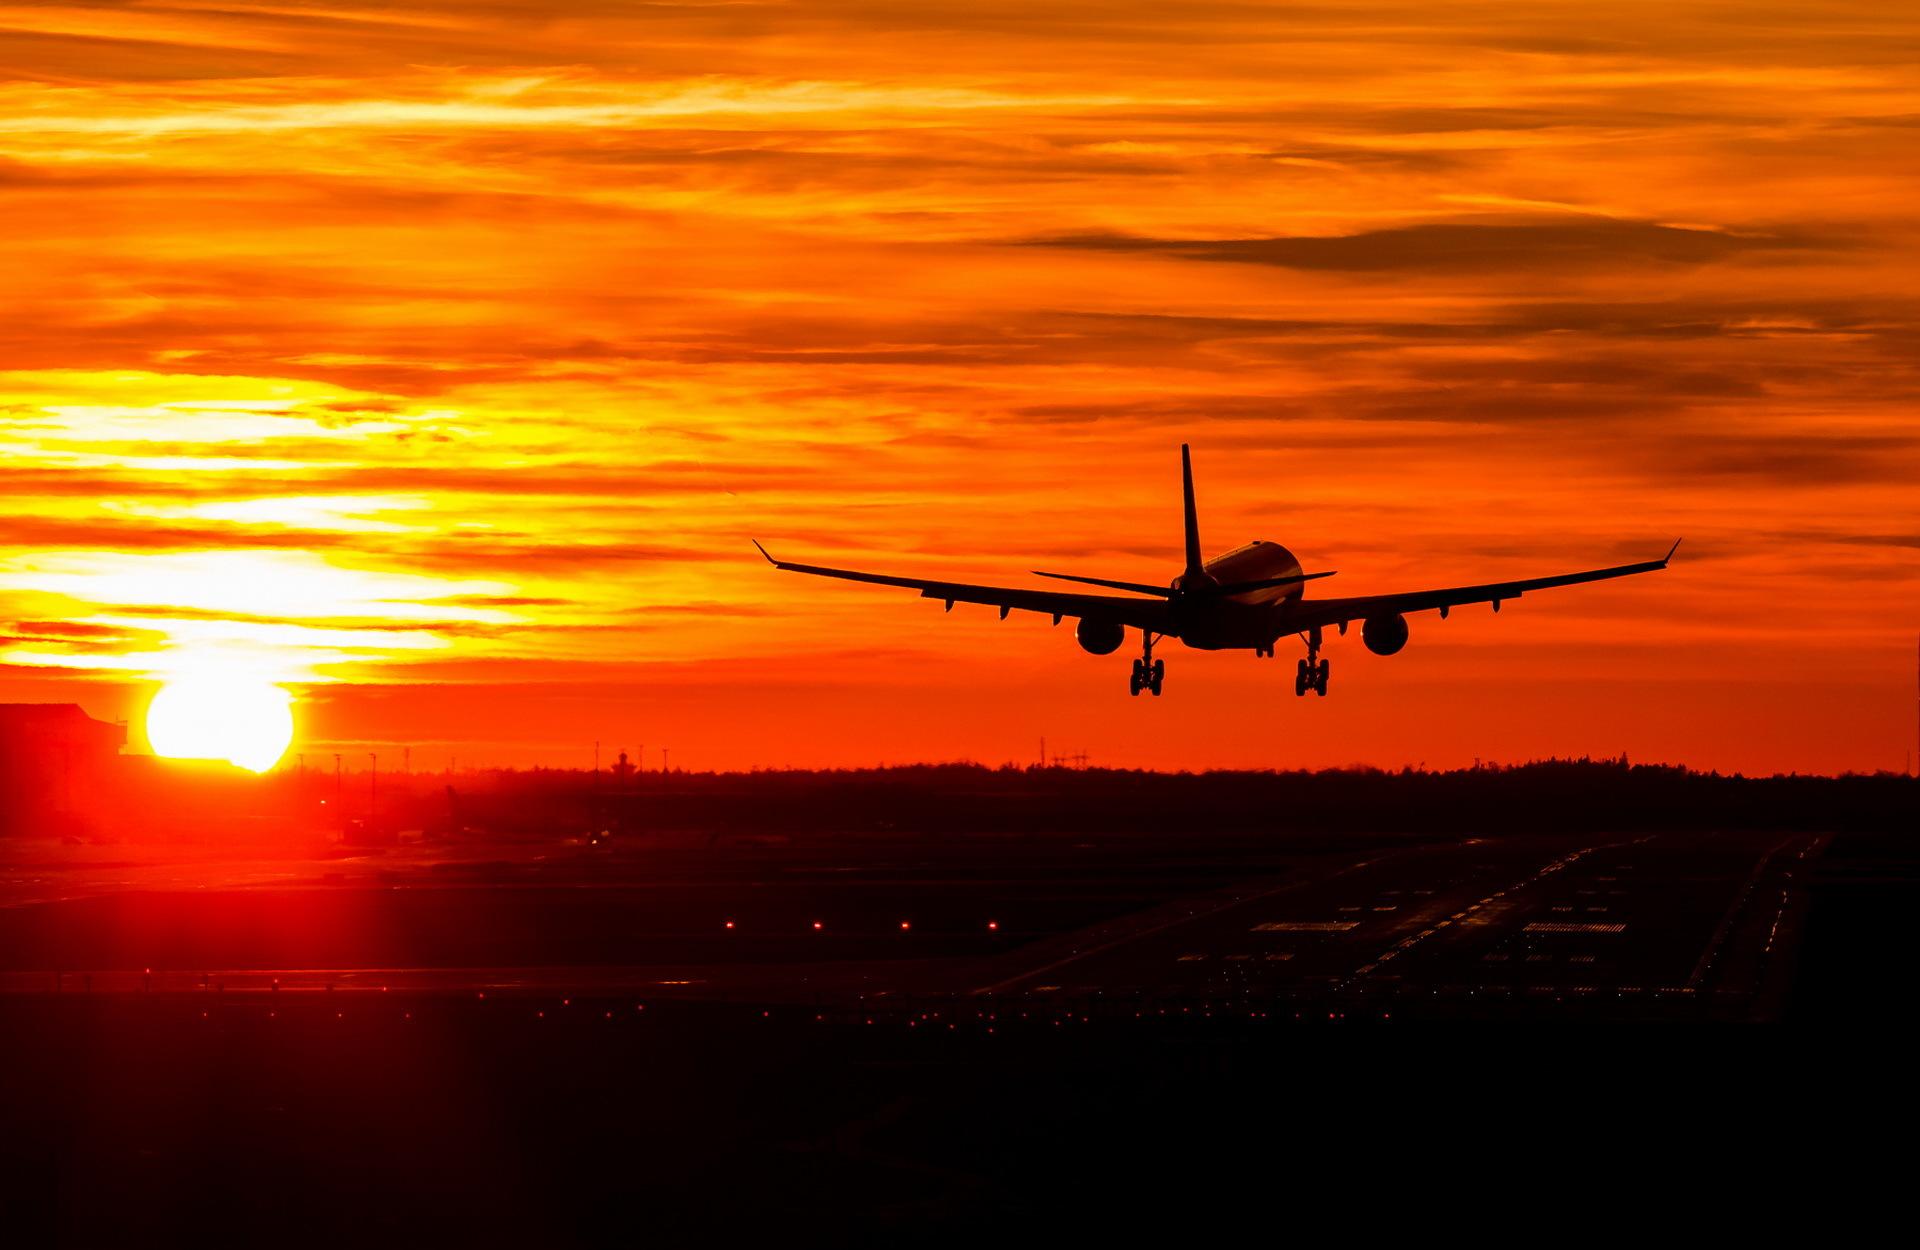 Helsinki Airport, Finnair Airbus A330-300 OH-LTU arriving ...